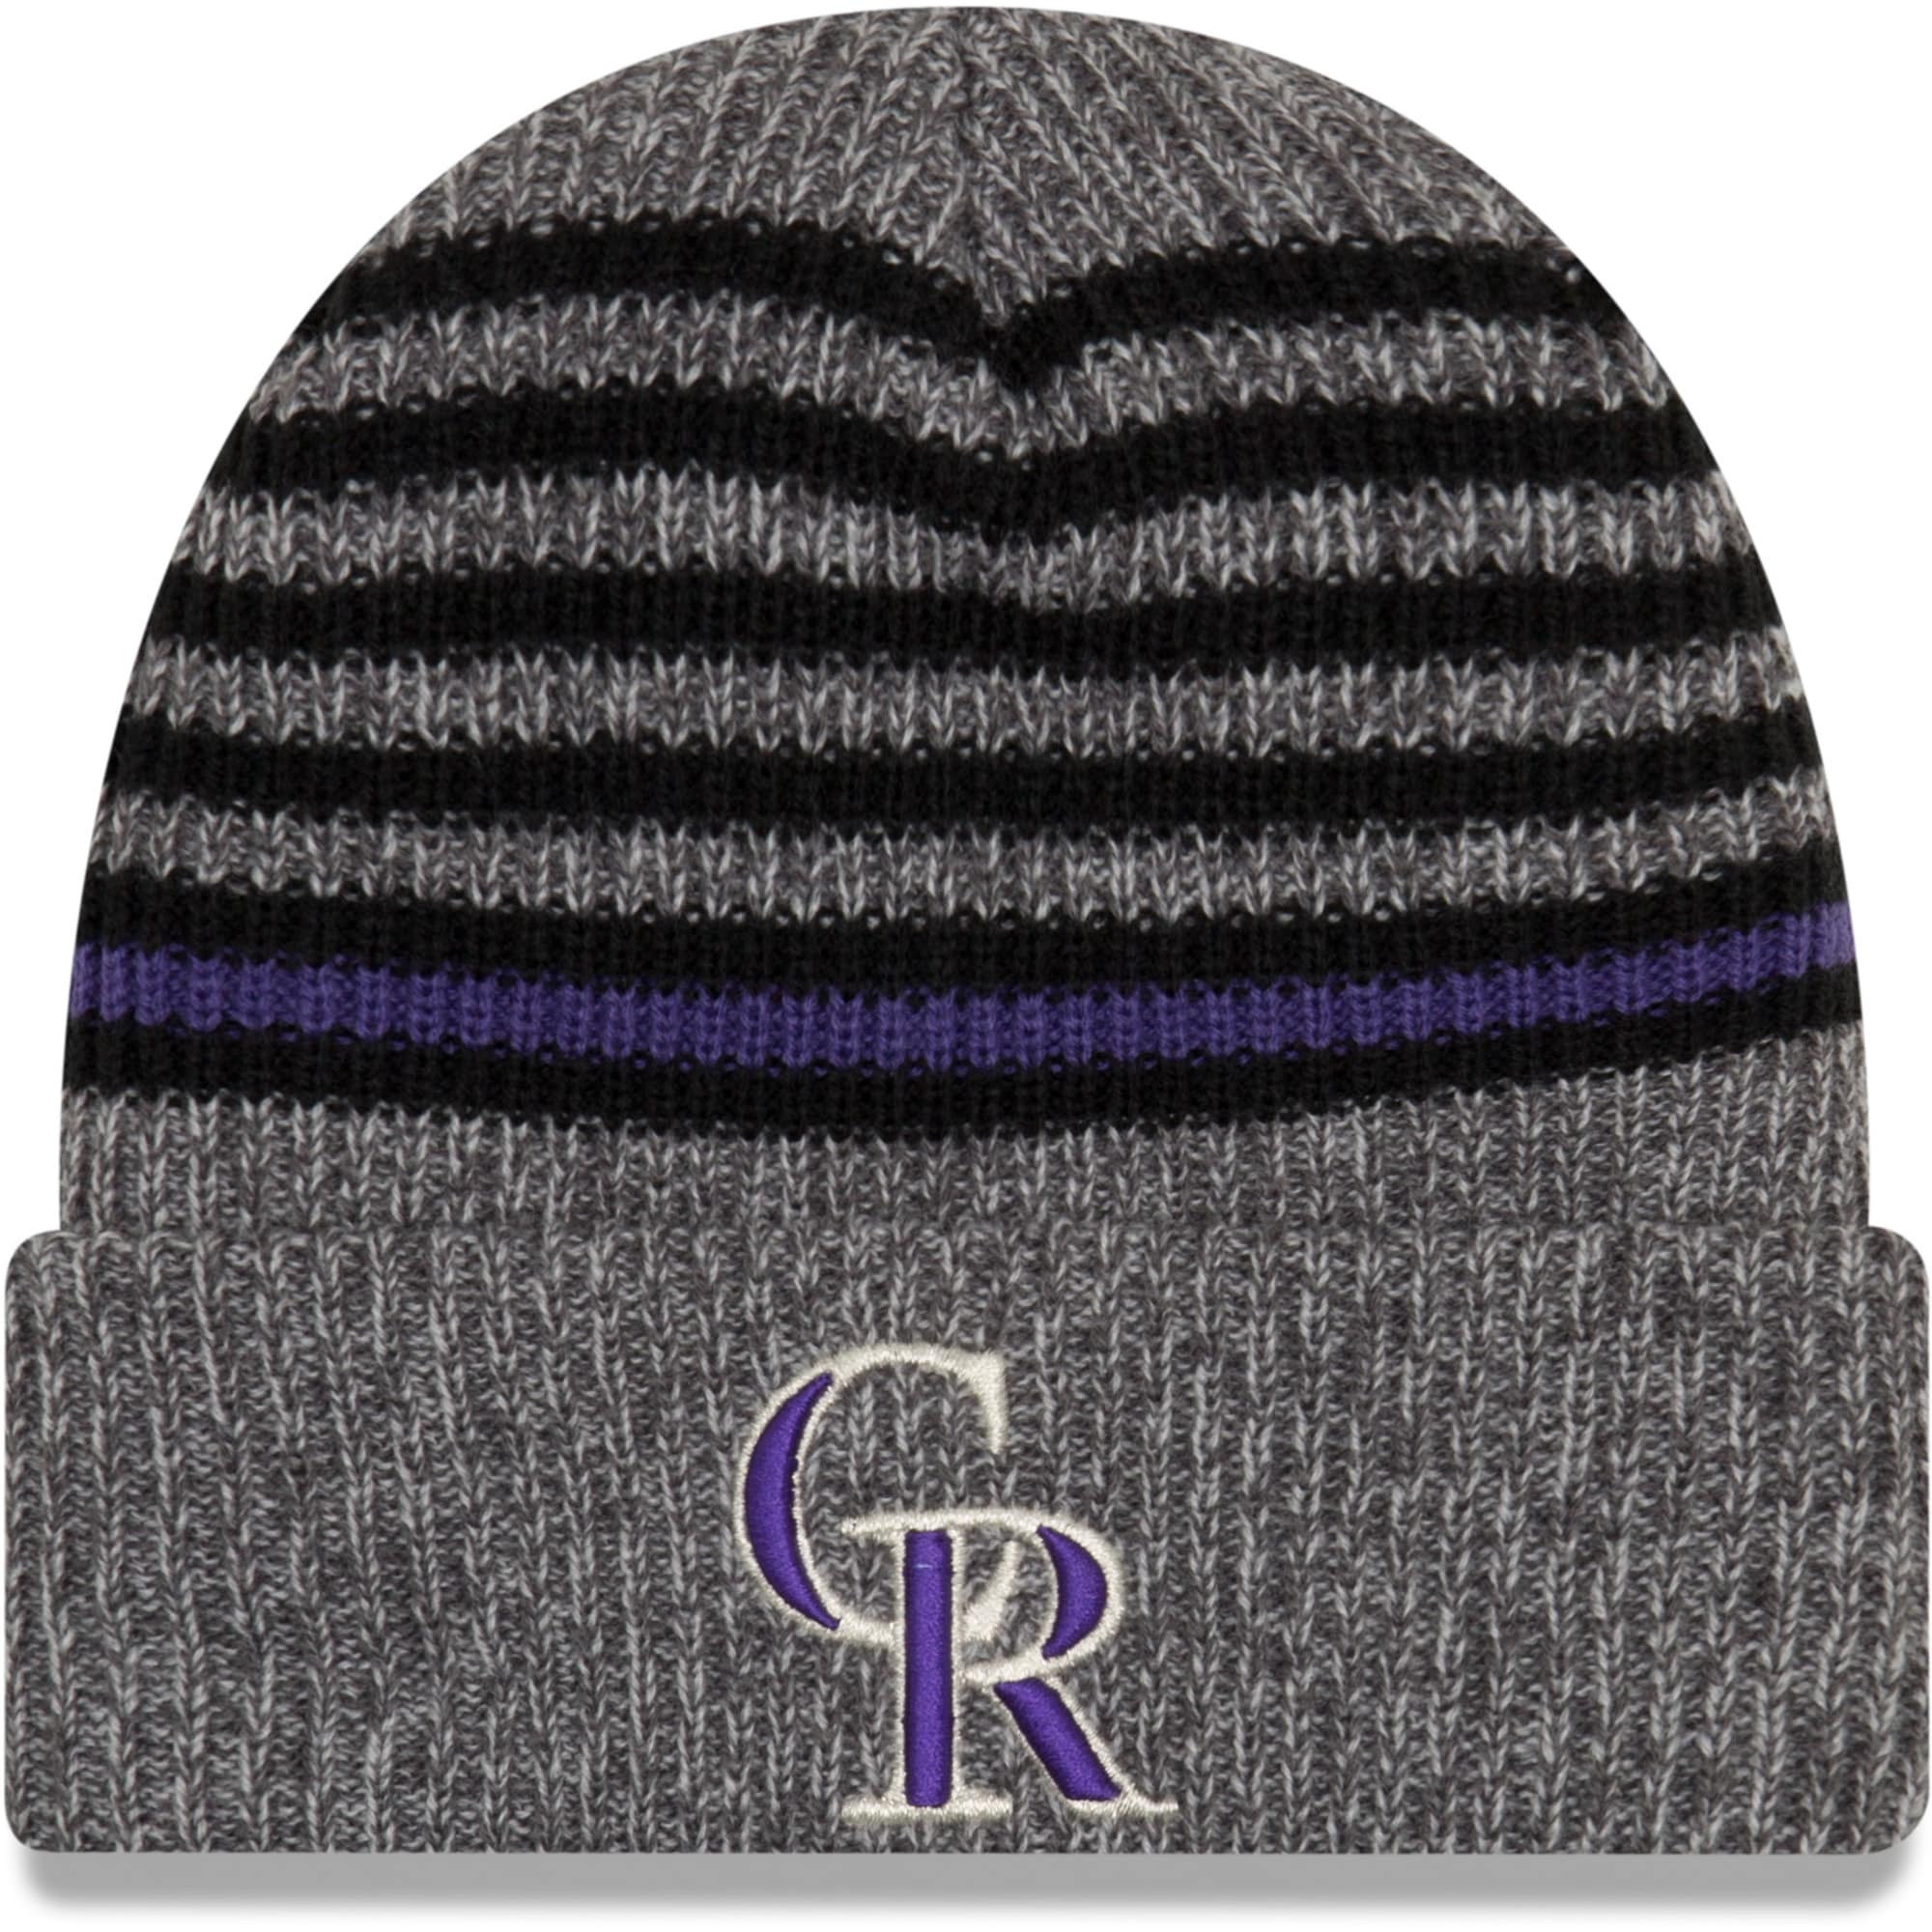 Colorado Rockies New Era Stripe Strong Cuffed Knit Hat - Gray